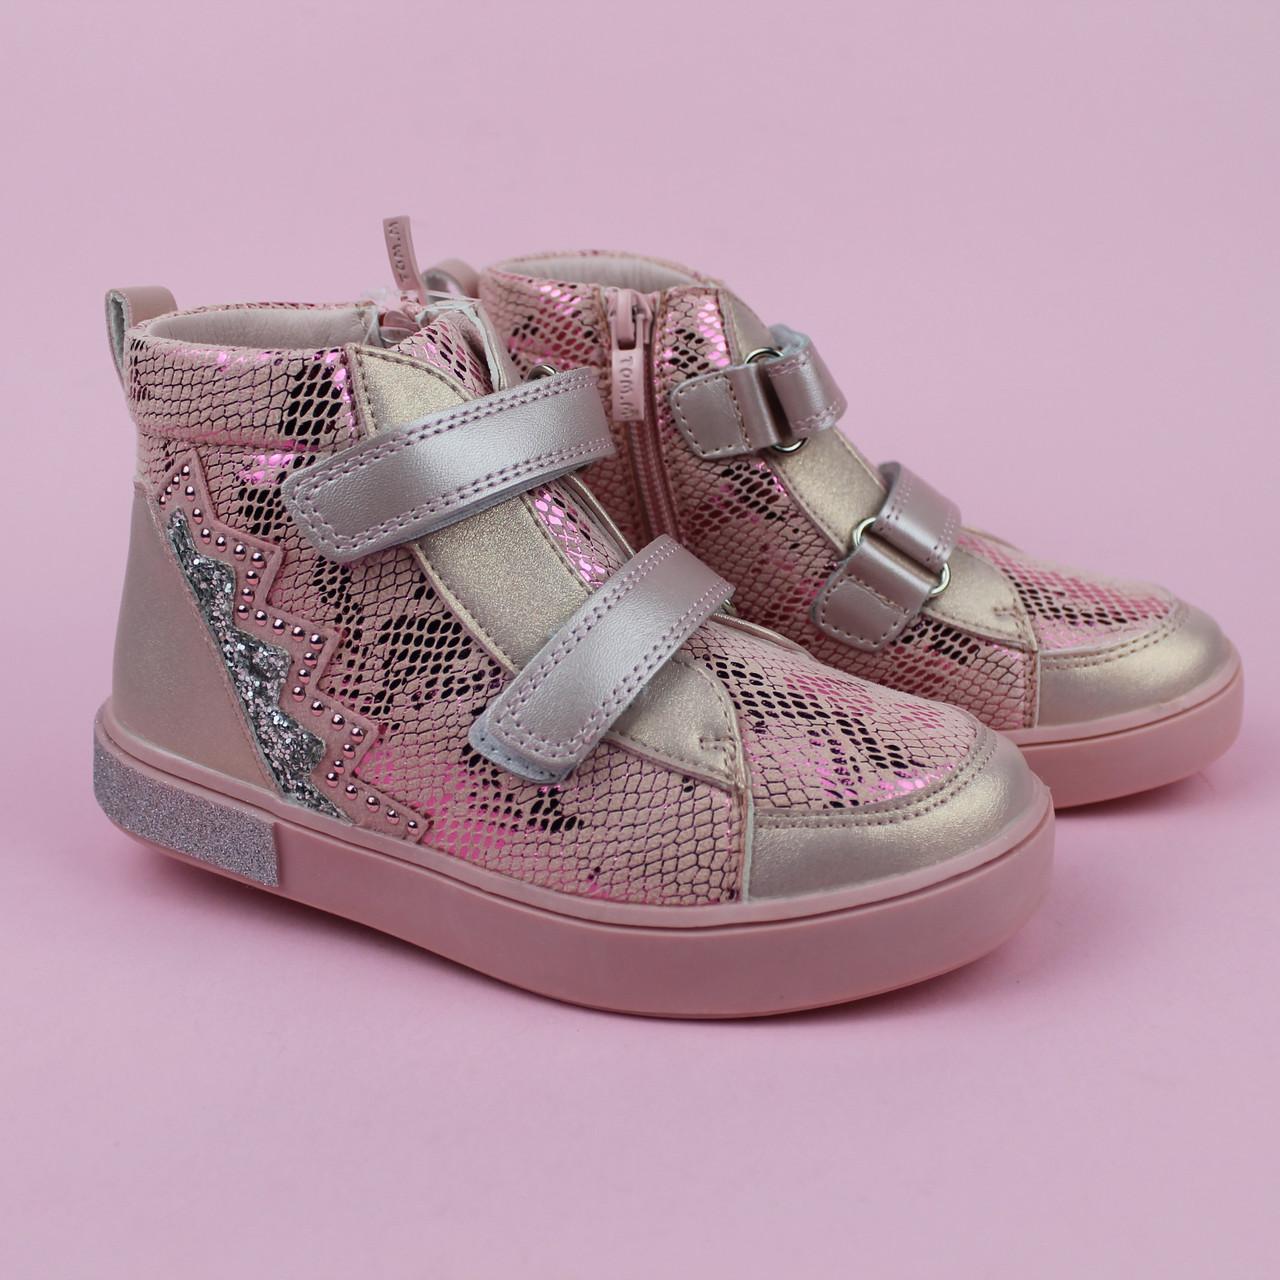 Демисезонные розовые ботинки для девочки тм Bi&Ki размер 27,28,29,30,31